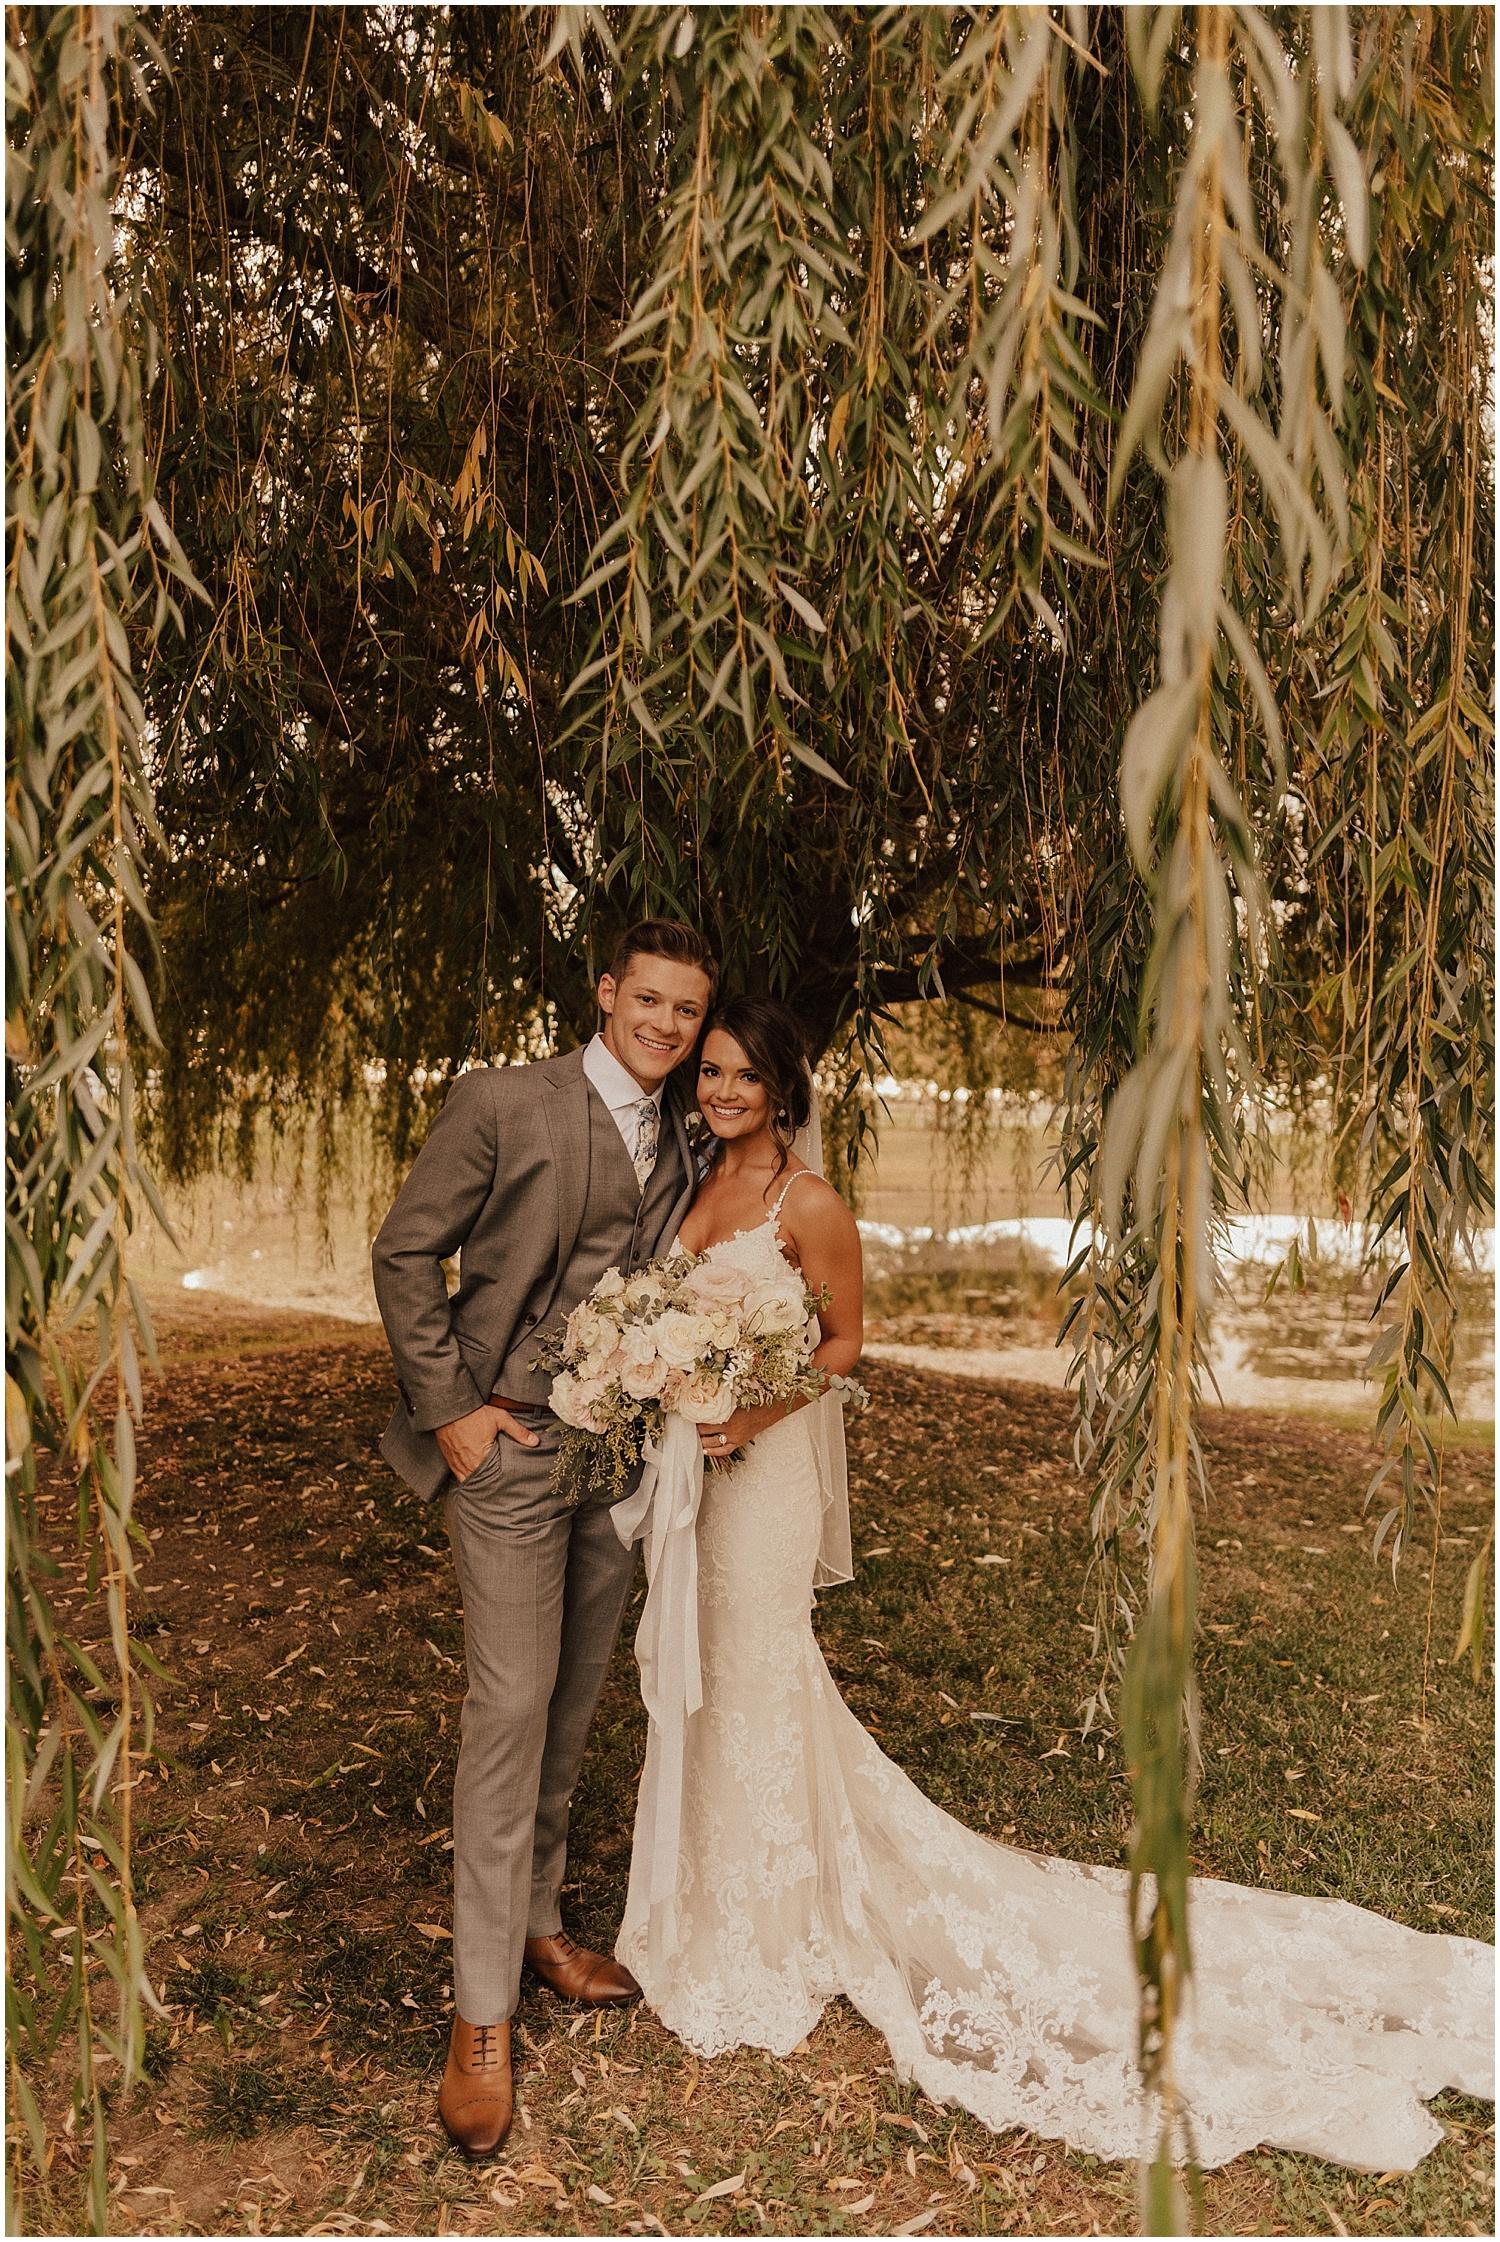 whimsical-summer-wedding-boise-idaho-las-vegas-bride168.jpg